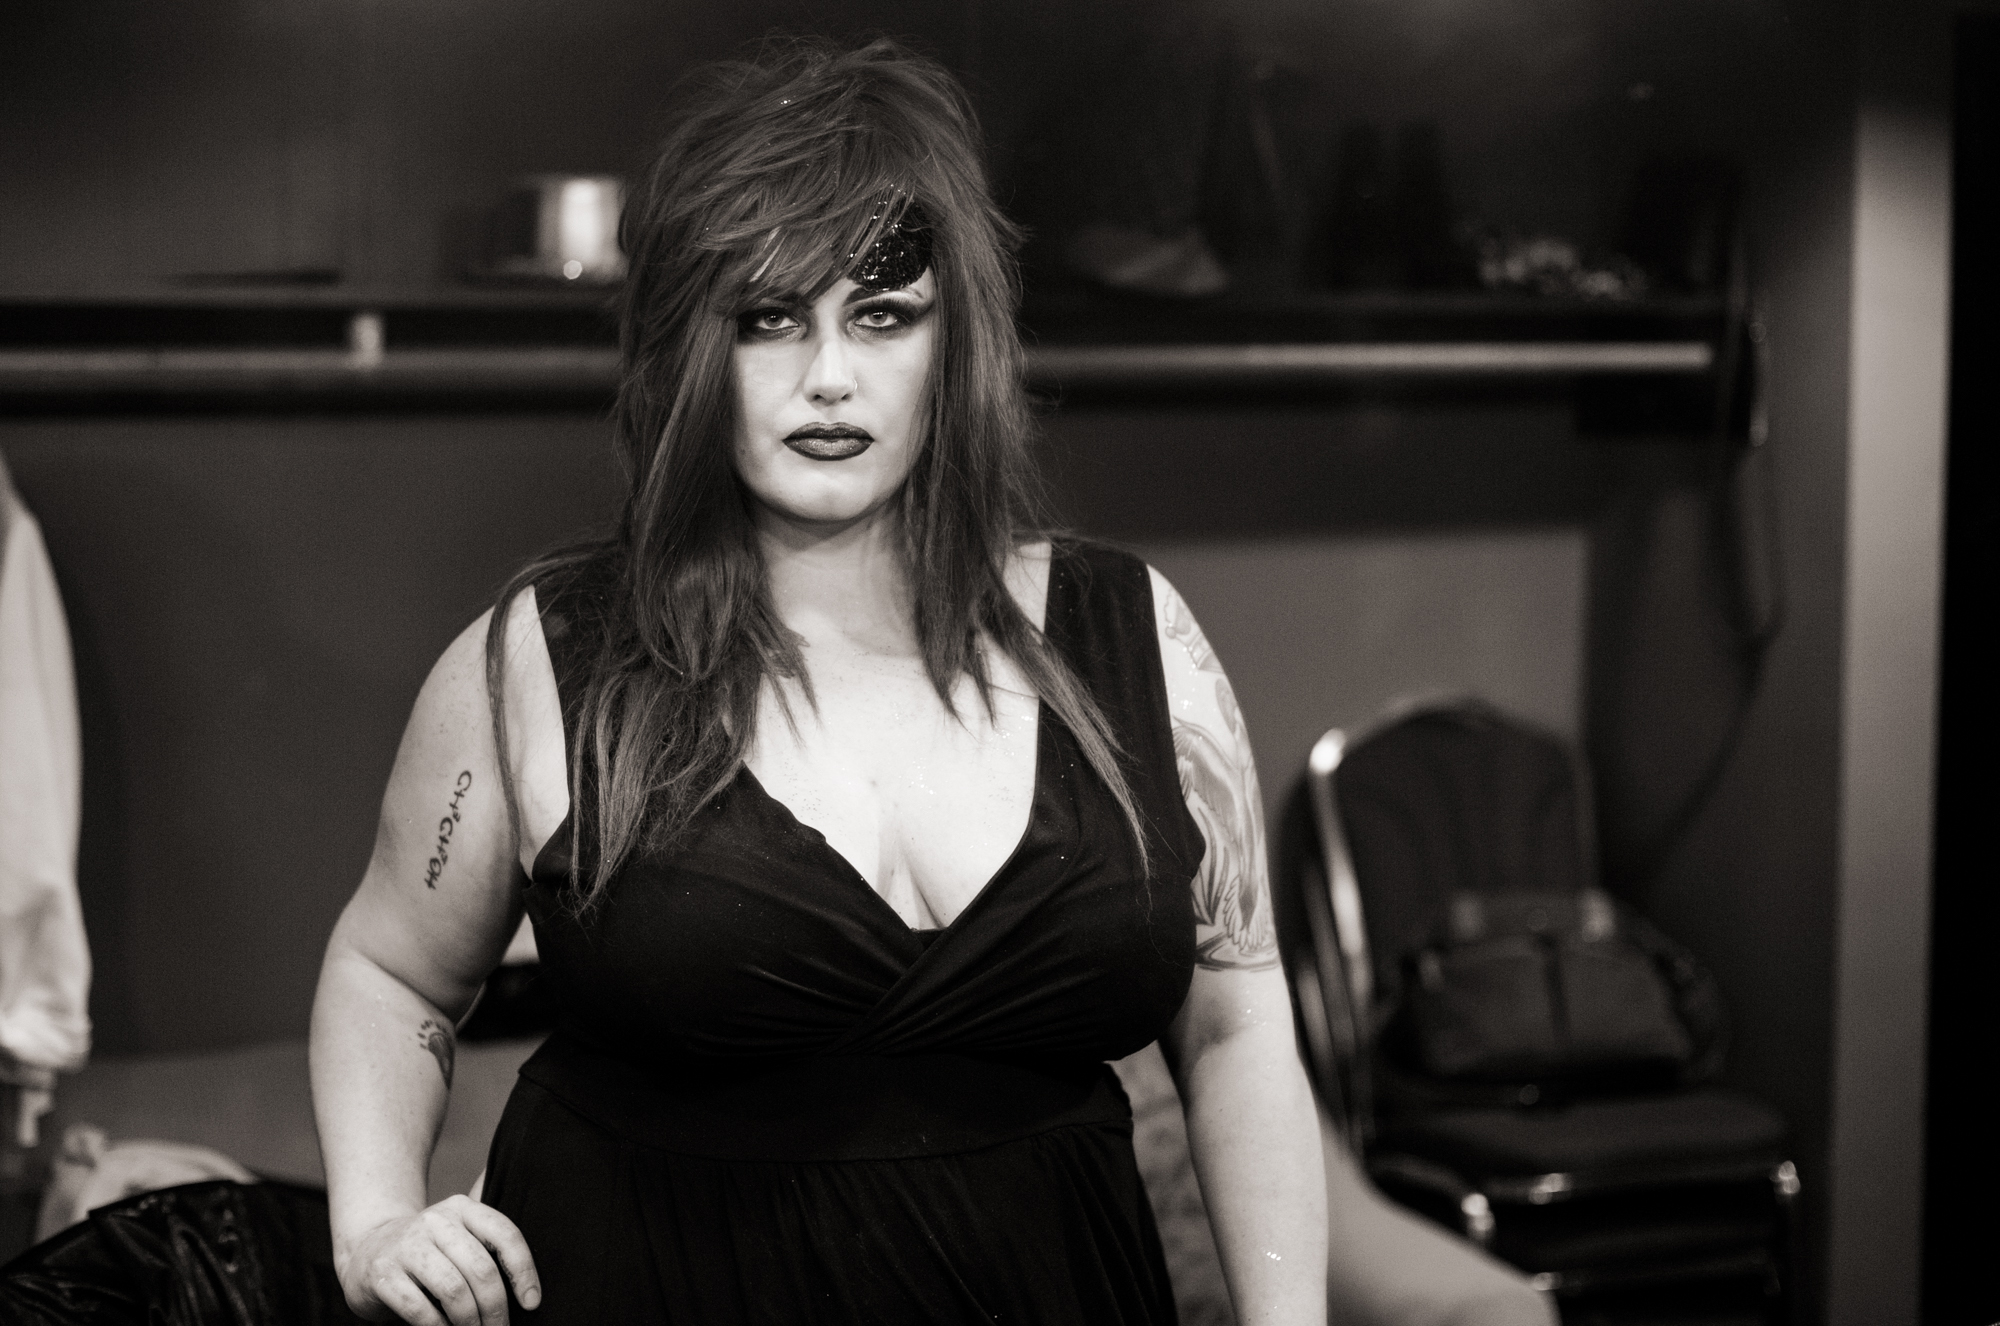 sarahpoephotography.women&bowie (46 of 48).jpg